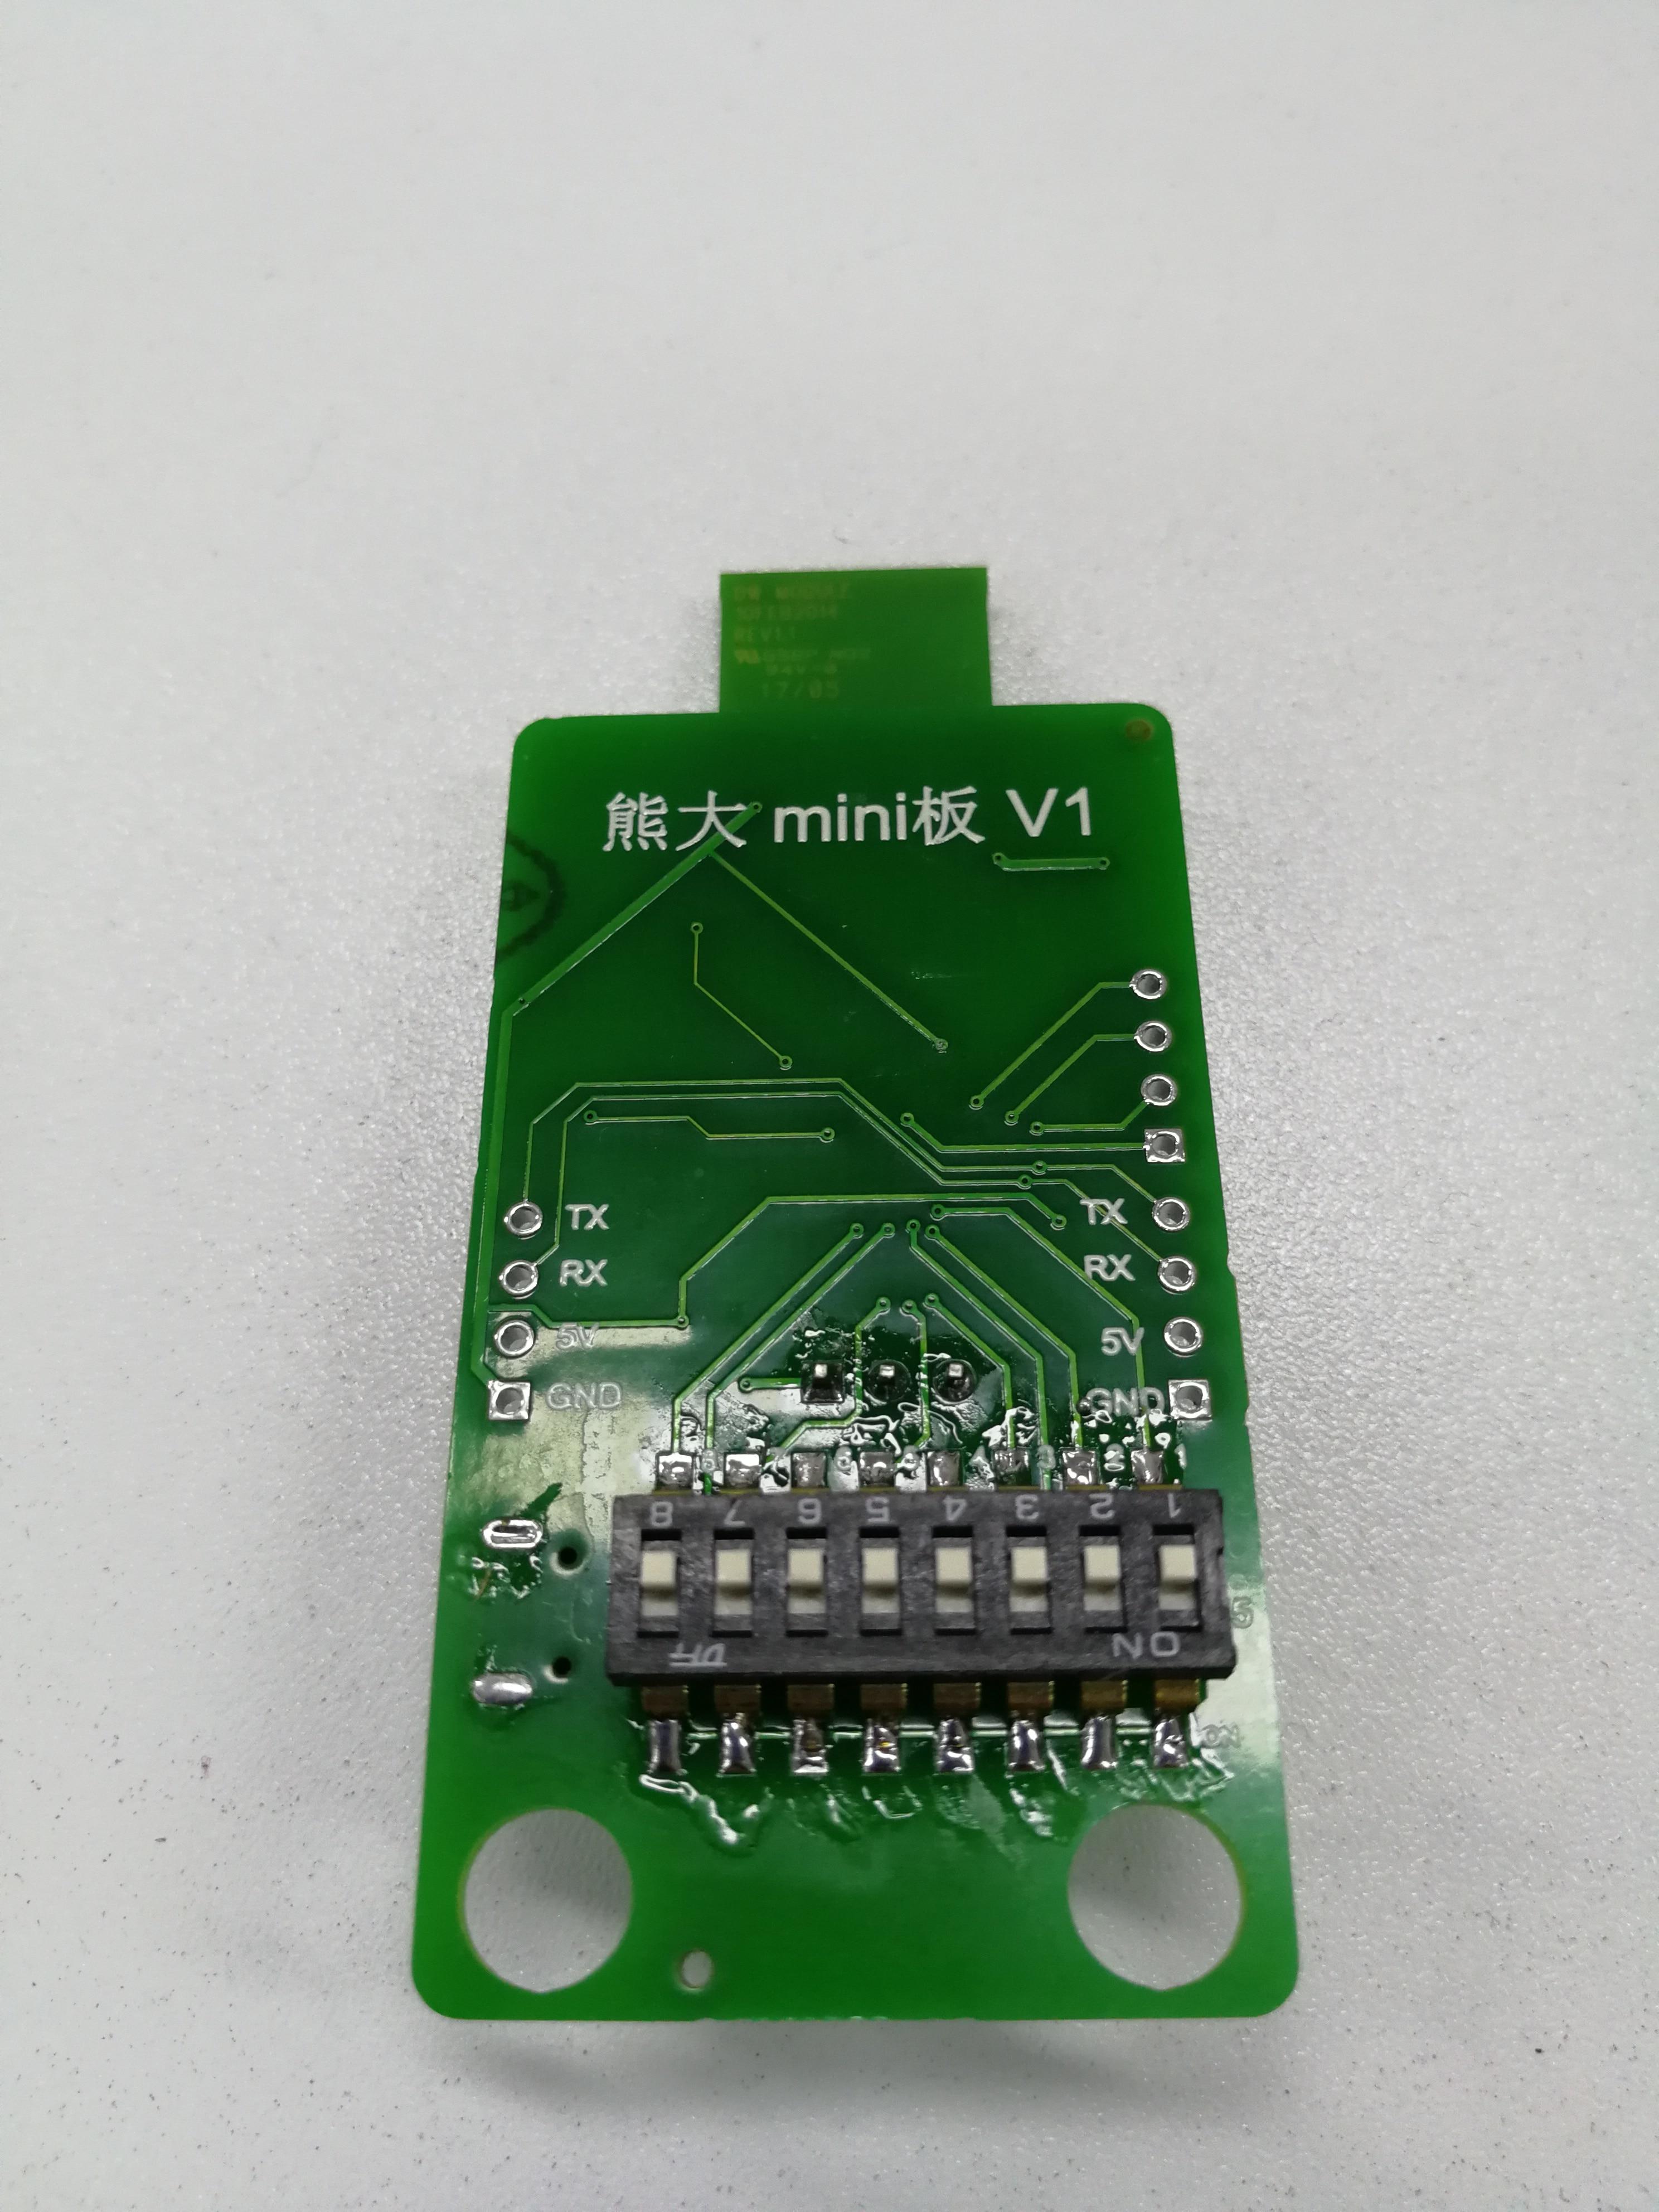 For Dwm1000 Ranging Module UWB Indoor Positioning And Ranging Module DW1000 UWB Positioning Module